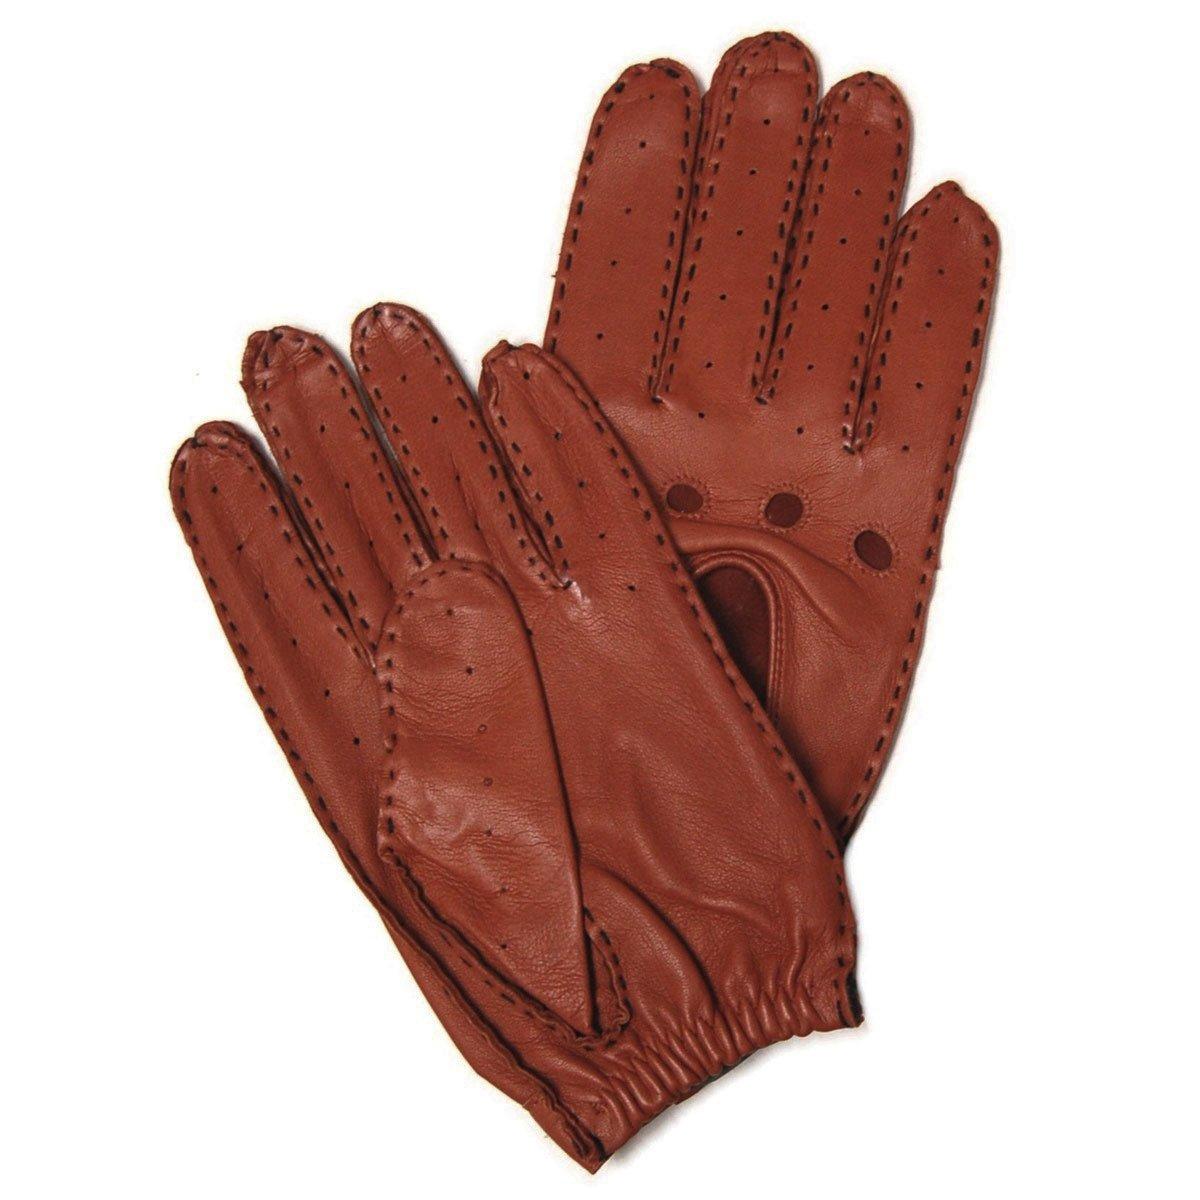 Hilts-Willard Men's Leather Driving Gloves - XL - Brown